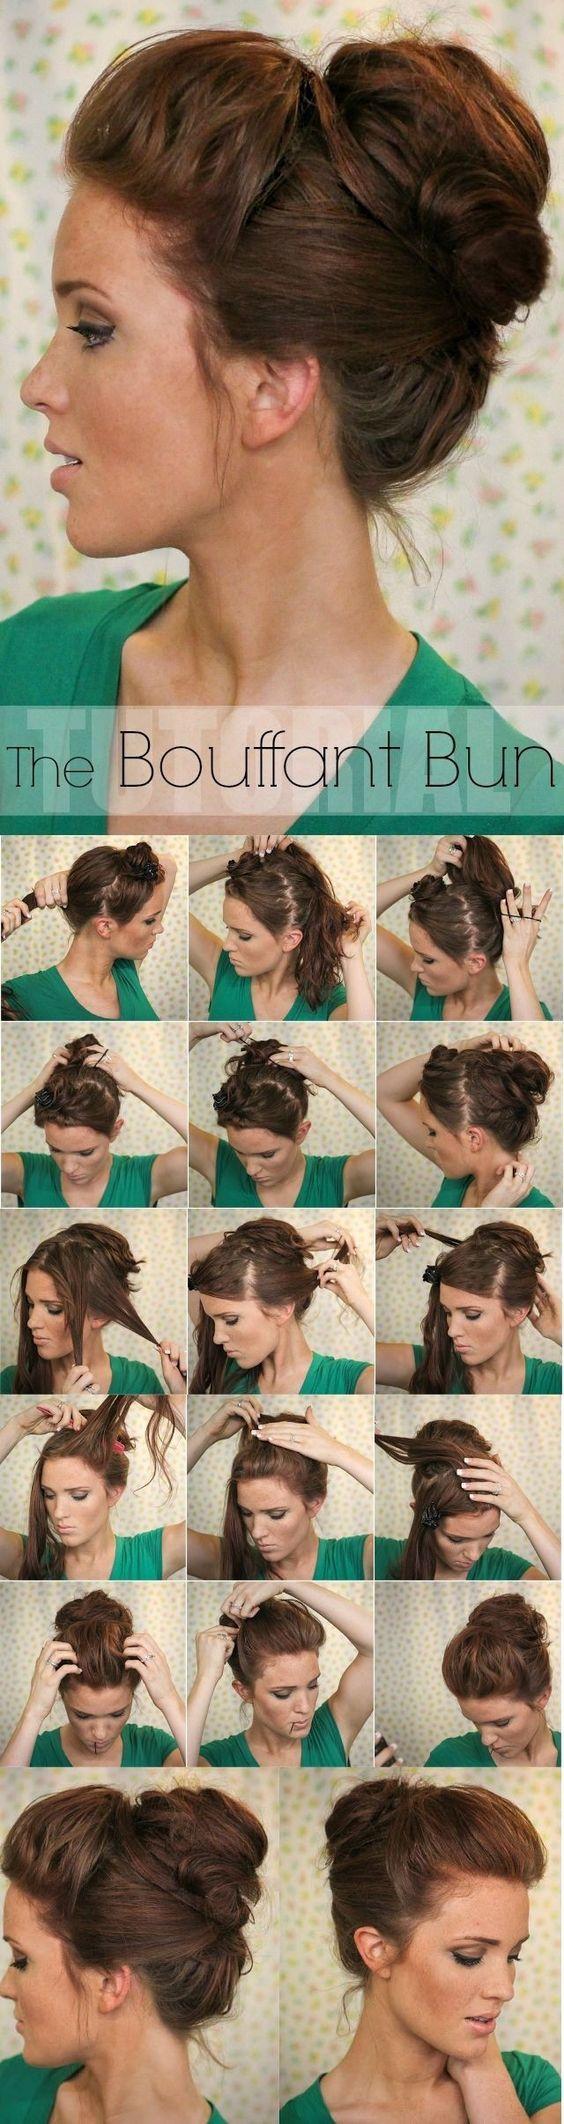 Super Easy Updo Hairstyles Tutorials Bouffant Bun